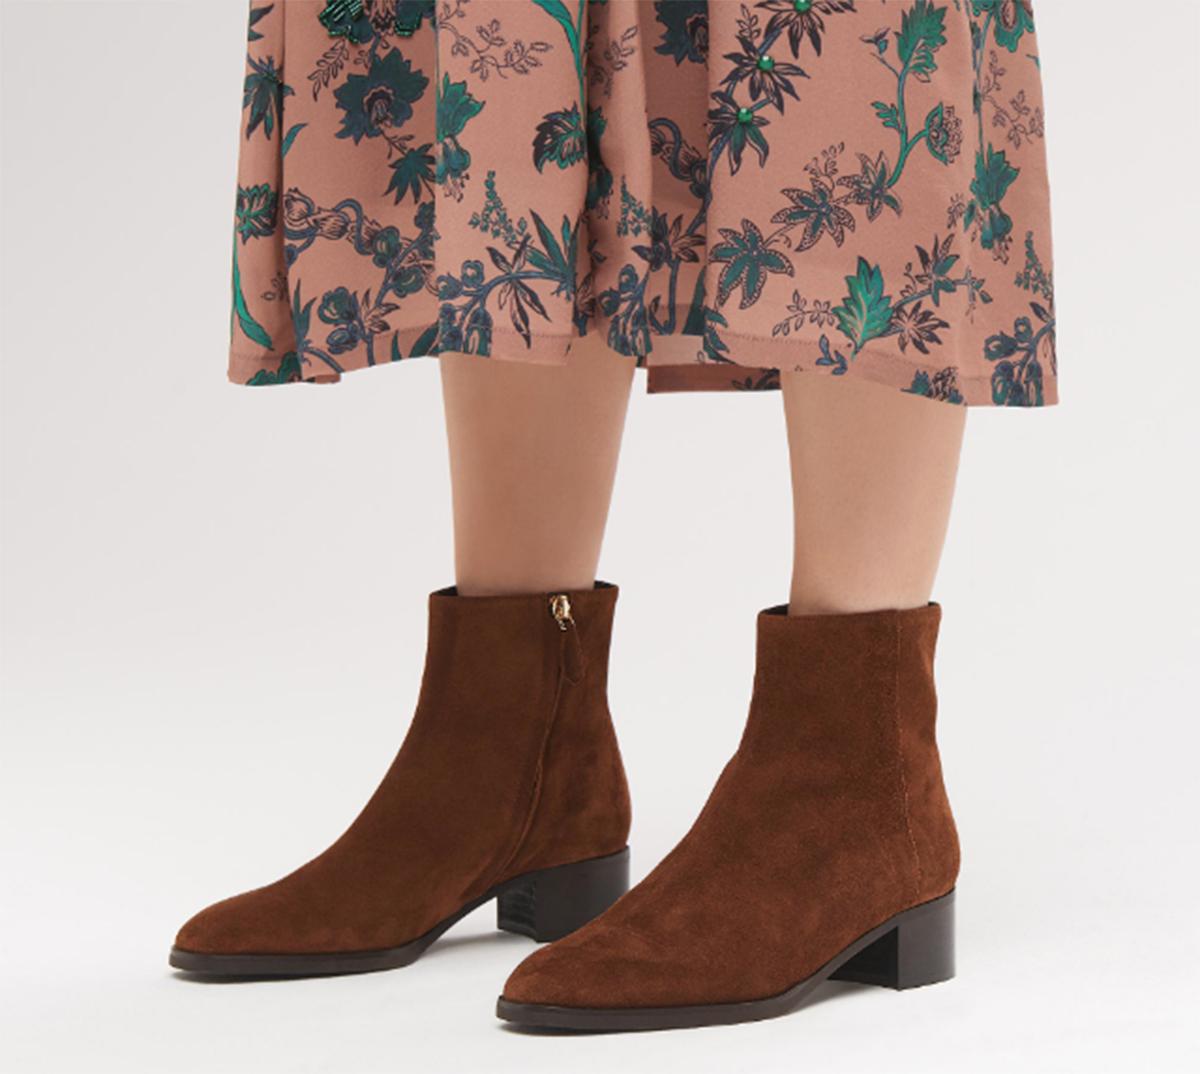 Ameli Boots